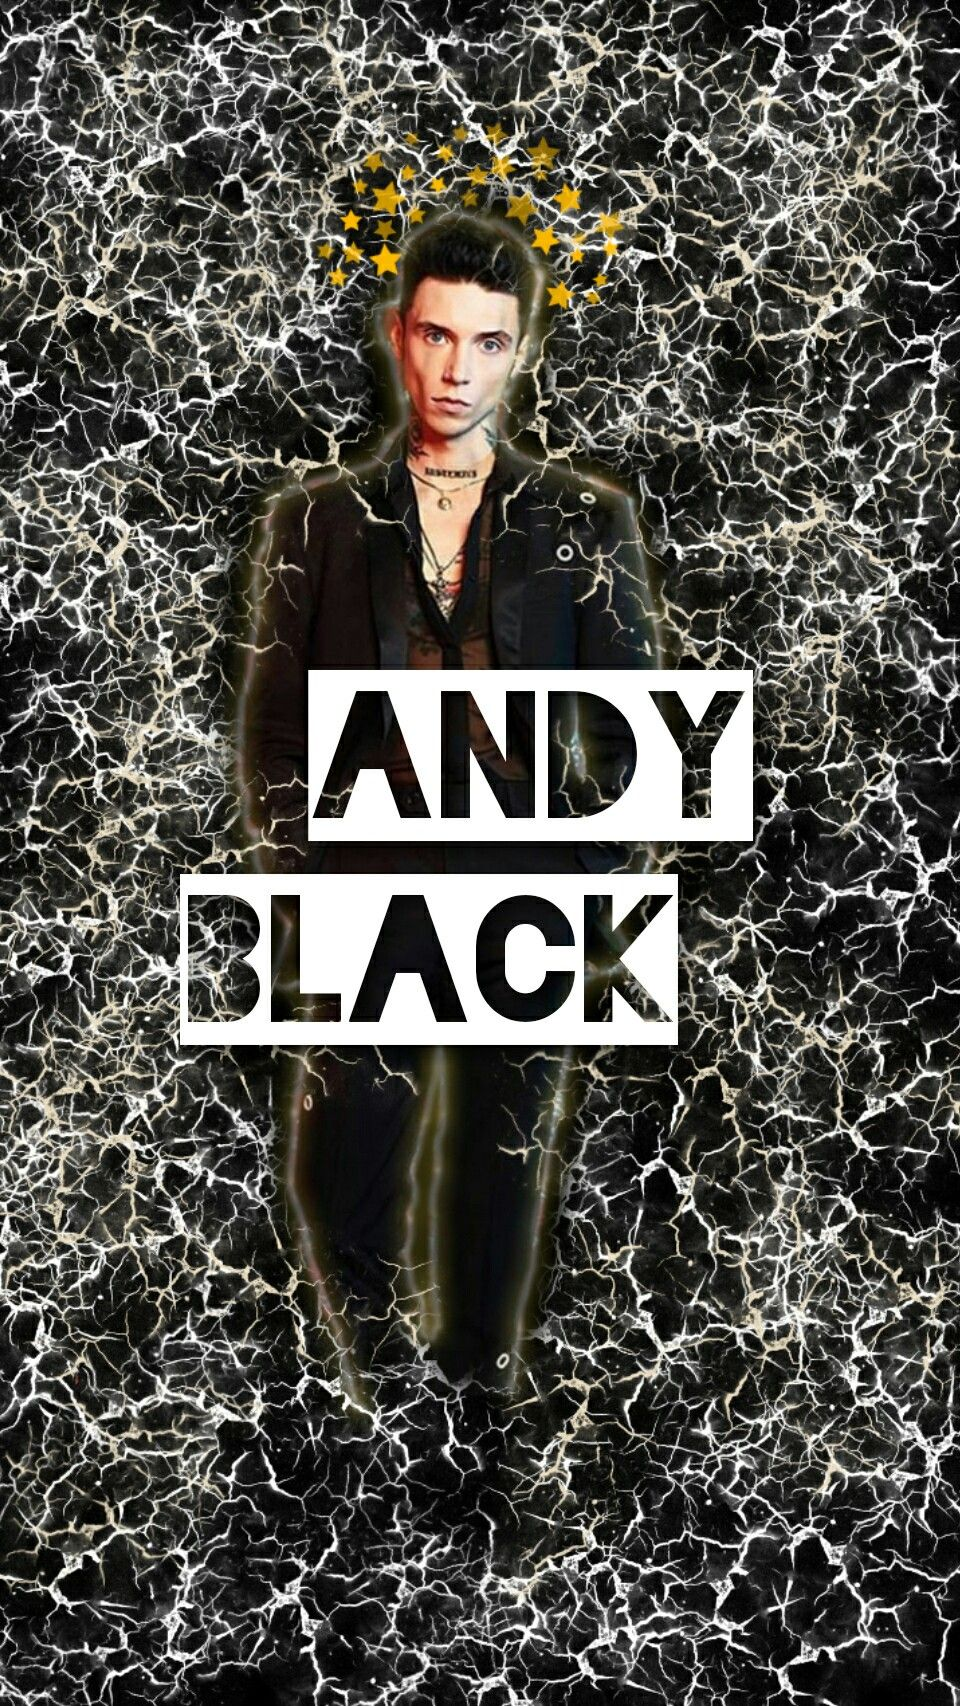 Andy Black Black Veil Brides Y Black Veil Brides